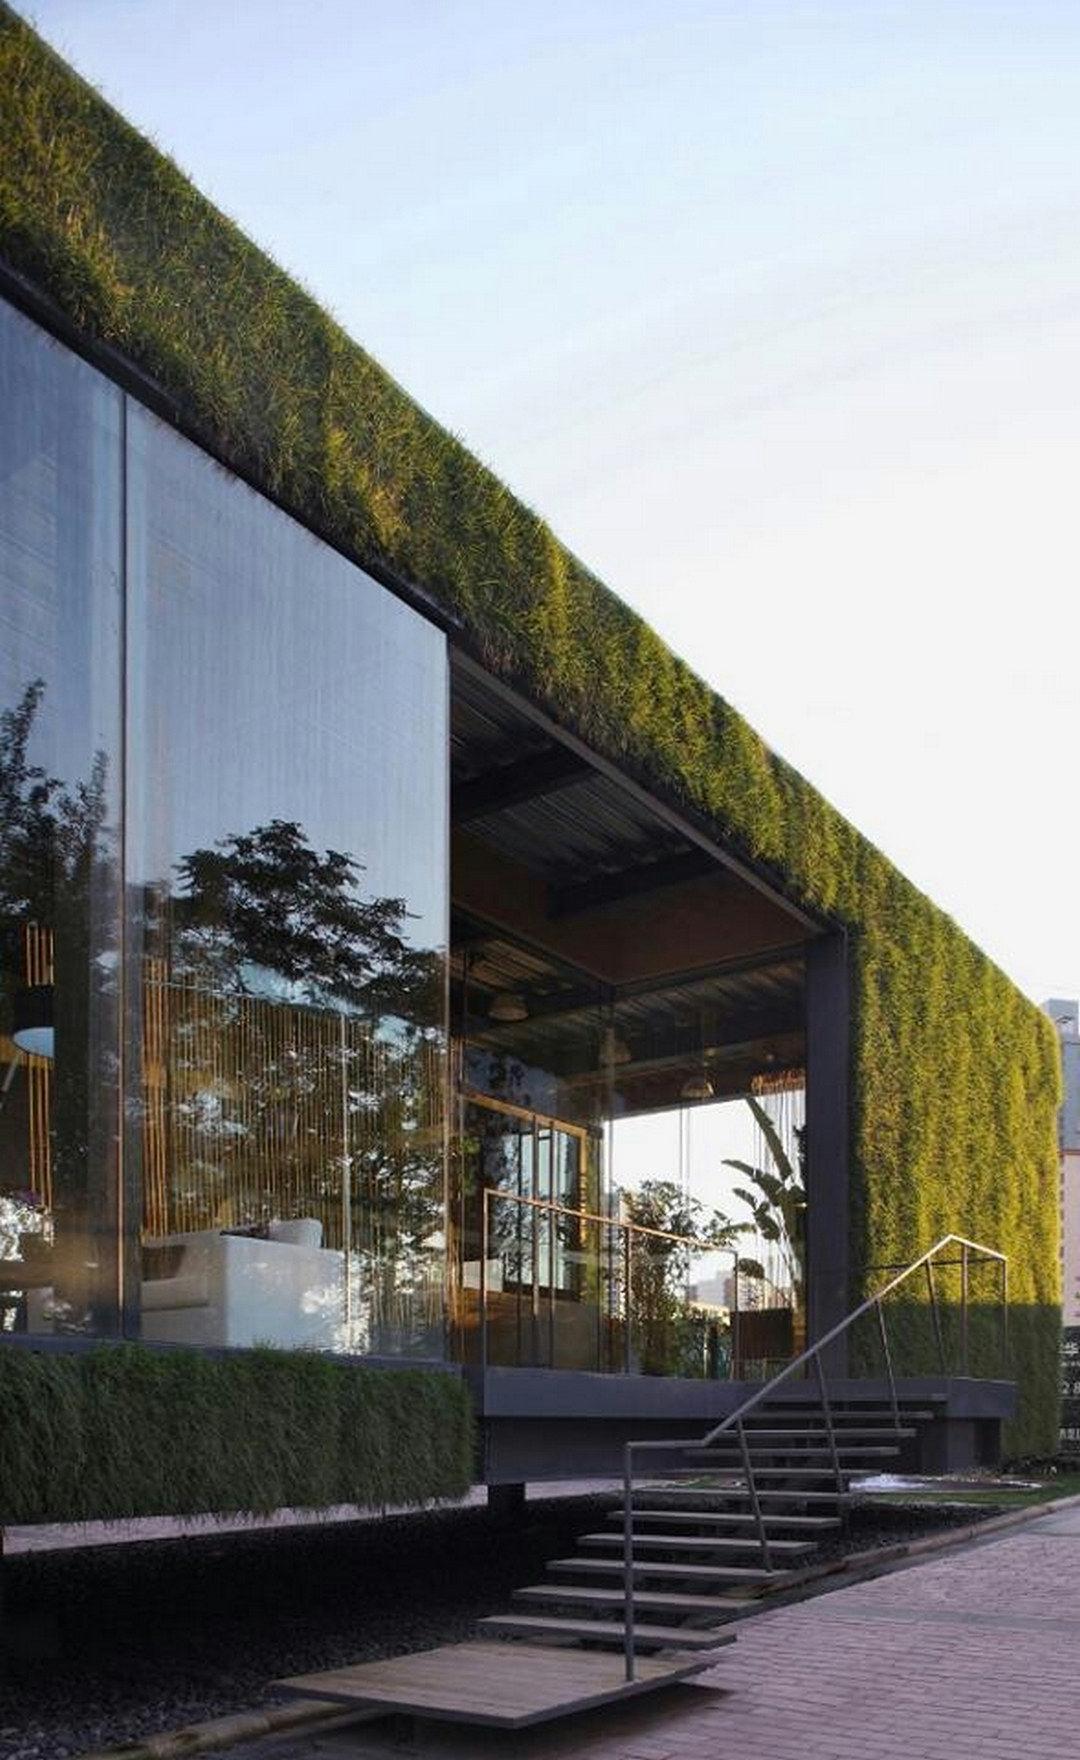 Sustainable Rooftop Garden Designs Html on